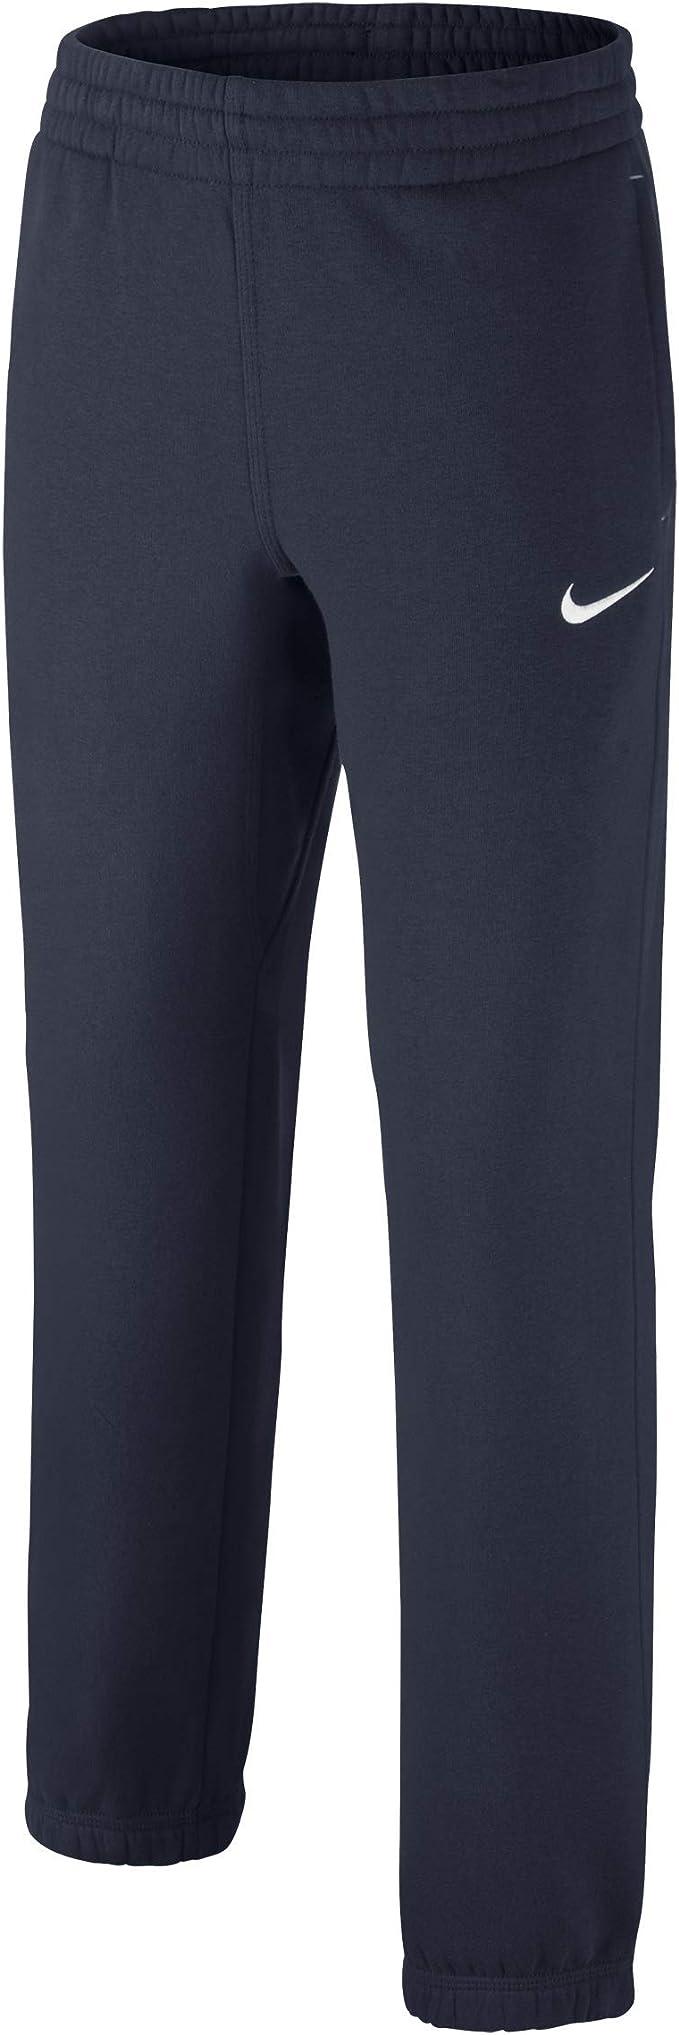 Nike Brushed Fleece Cuffed Pantalones, Niños: Amazon.es: Ropa y ...